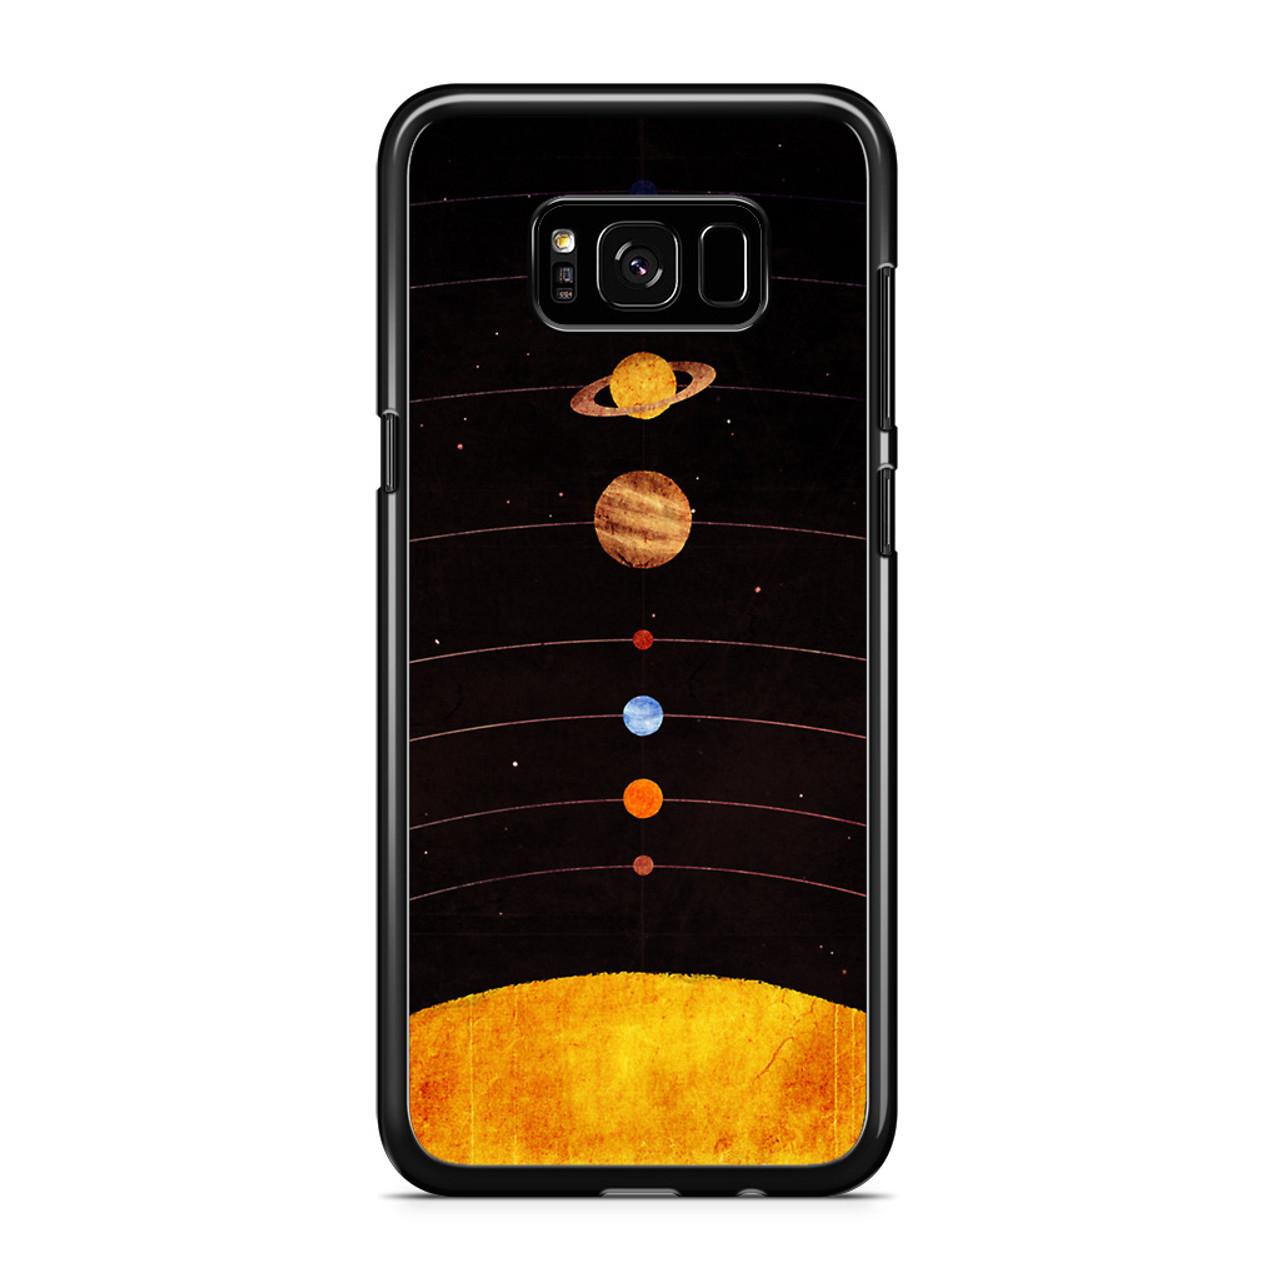 sale retailer d62a4 666b6 Solar System Samsung Galaxy S8 Case